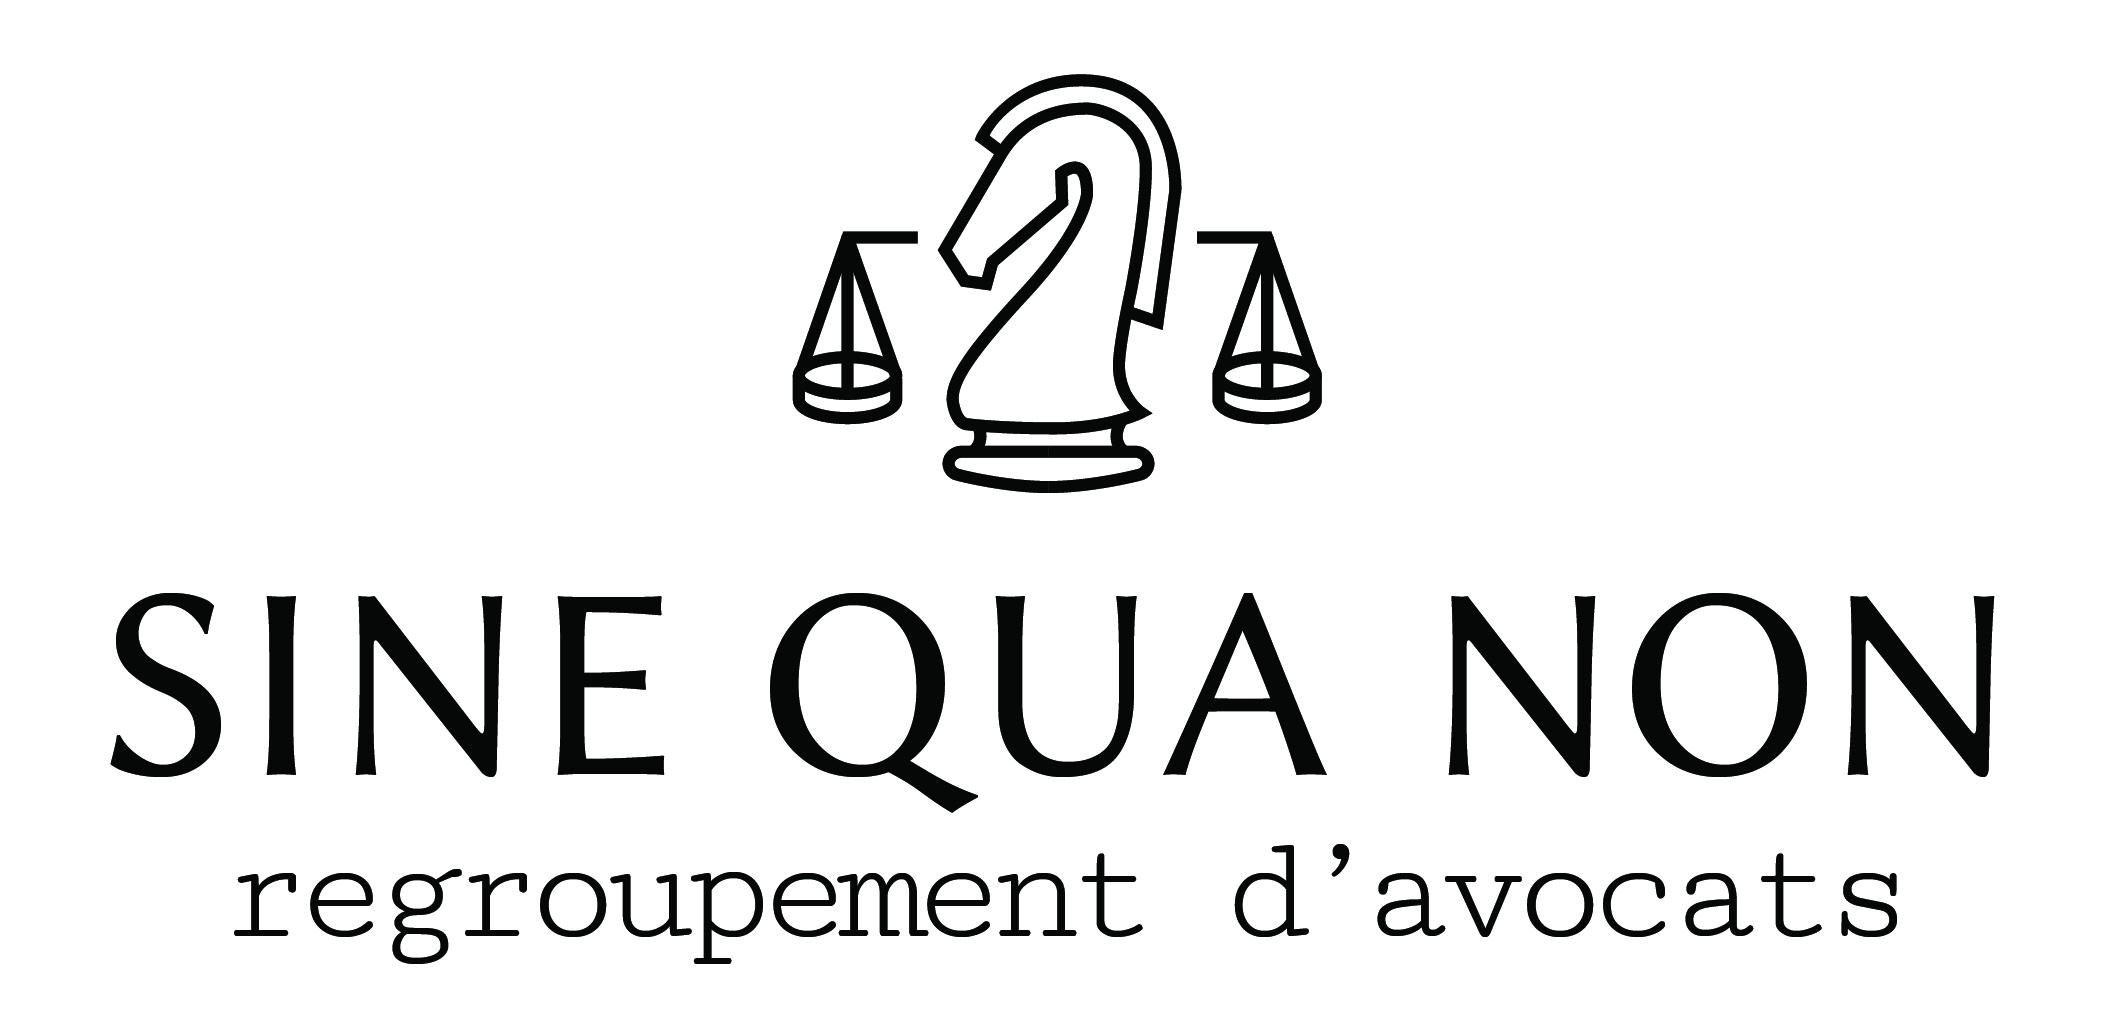 Sine Qua Non - regroupement d'avocats